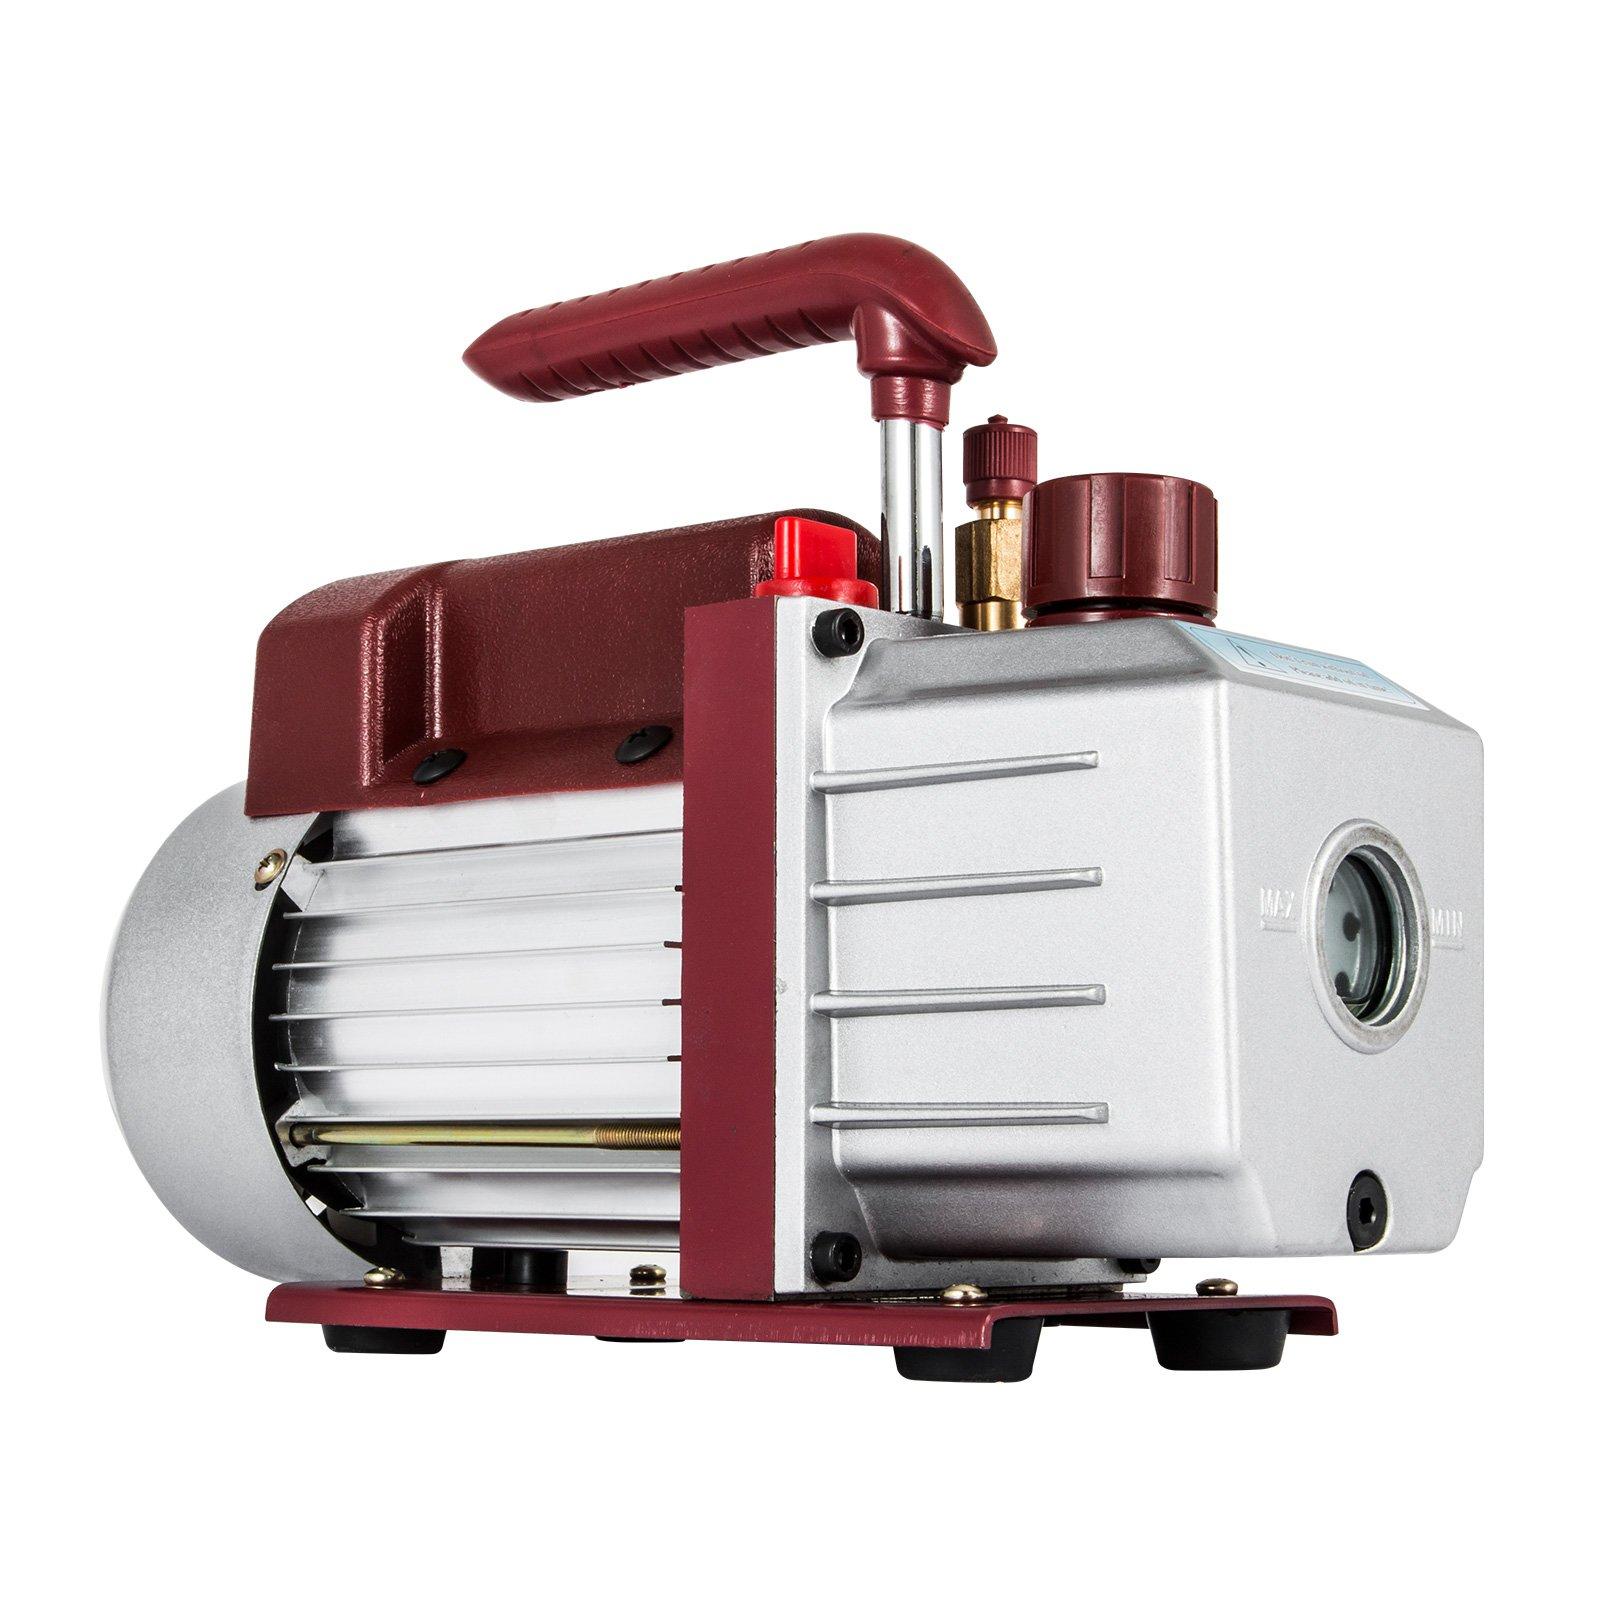 LOVSHARE 4.5CFM 1/3HP Vacuum Pump 110V 2 Meter Valve 1 Stage 5PA Ultimate Air Conditioning Refrigerant Vacuum Pump for HVAC/Auto AC Refrigerant Recharging Degassing wine epoxy Milking cow lamb Medical